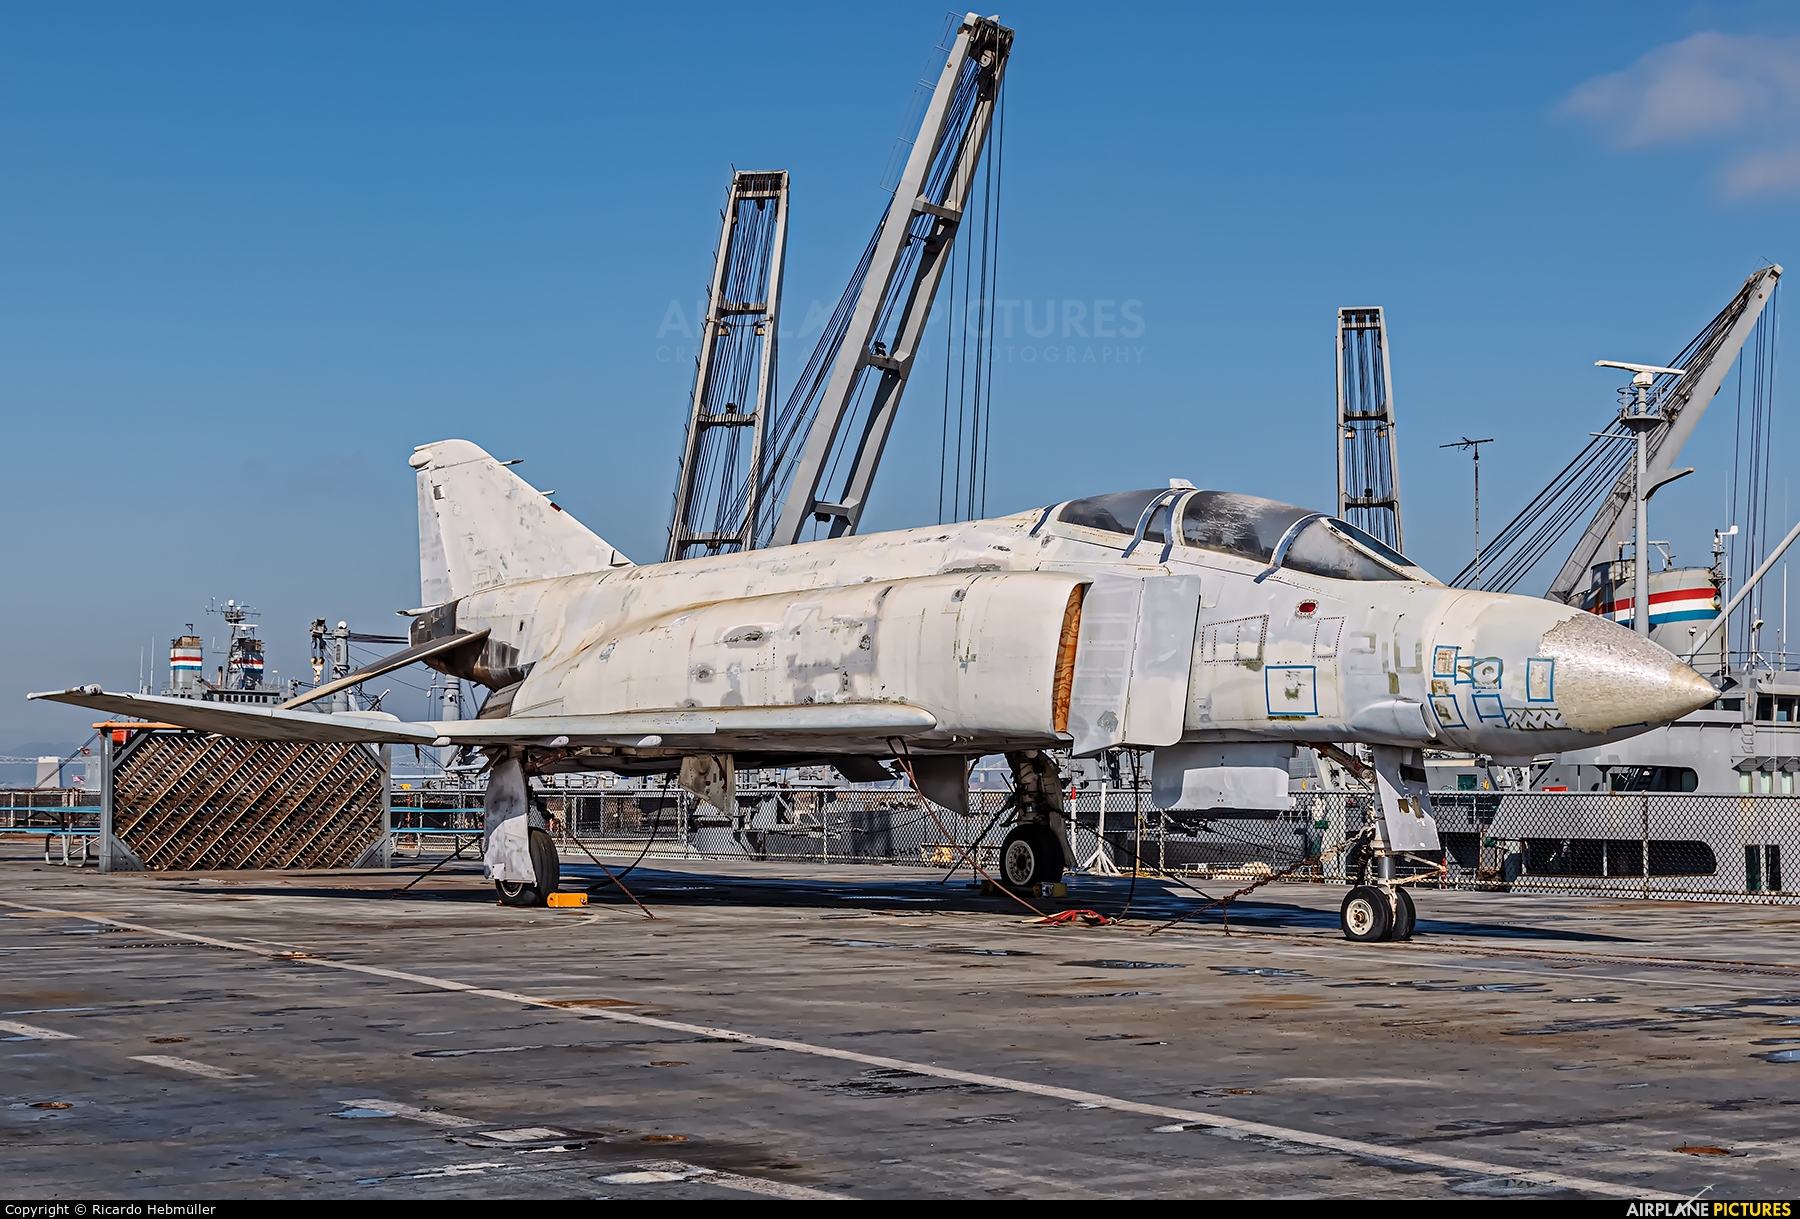 USA - Navy 153879 aircraft at Alameda - USS Hornet Museum